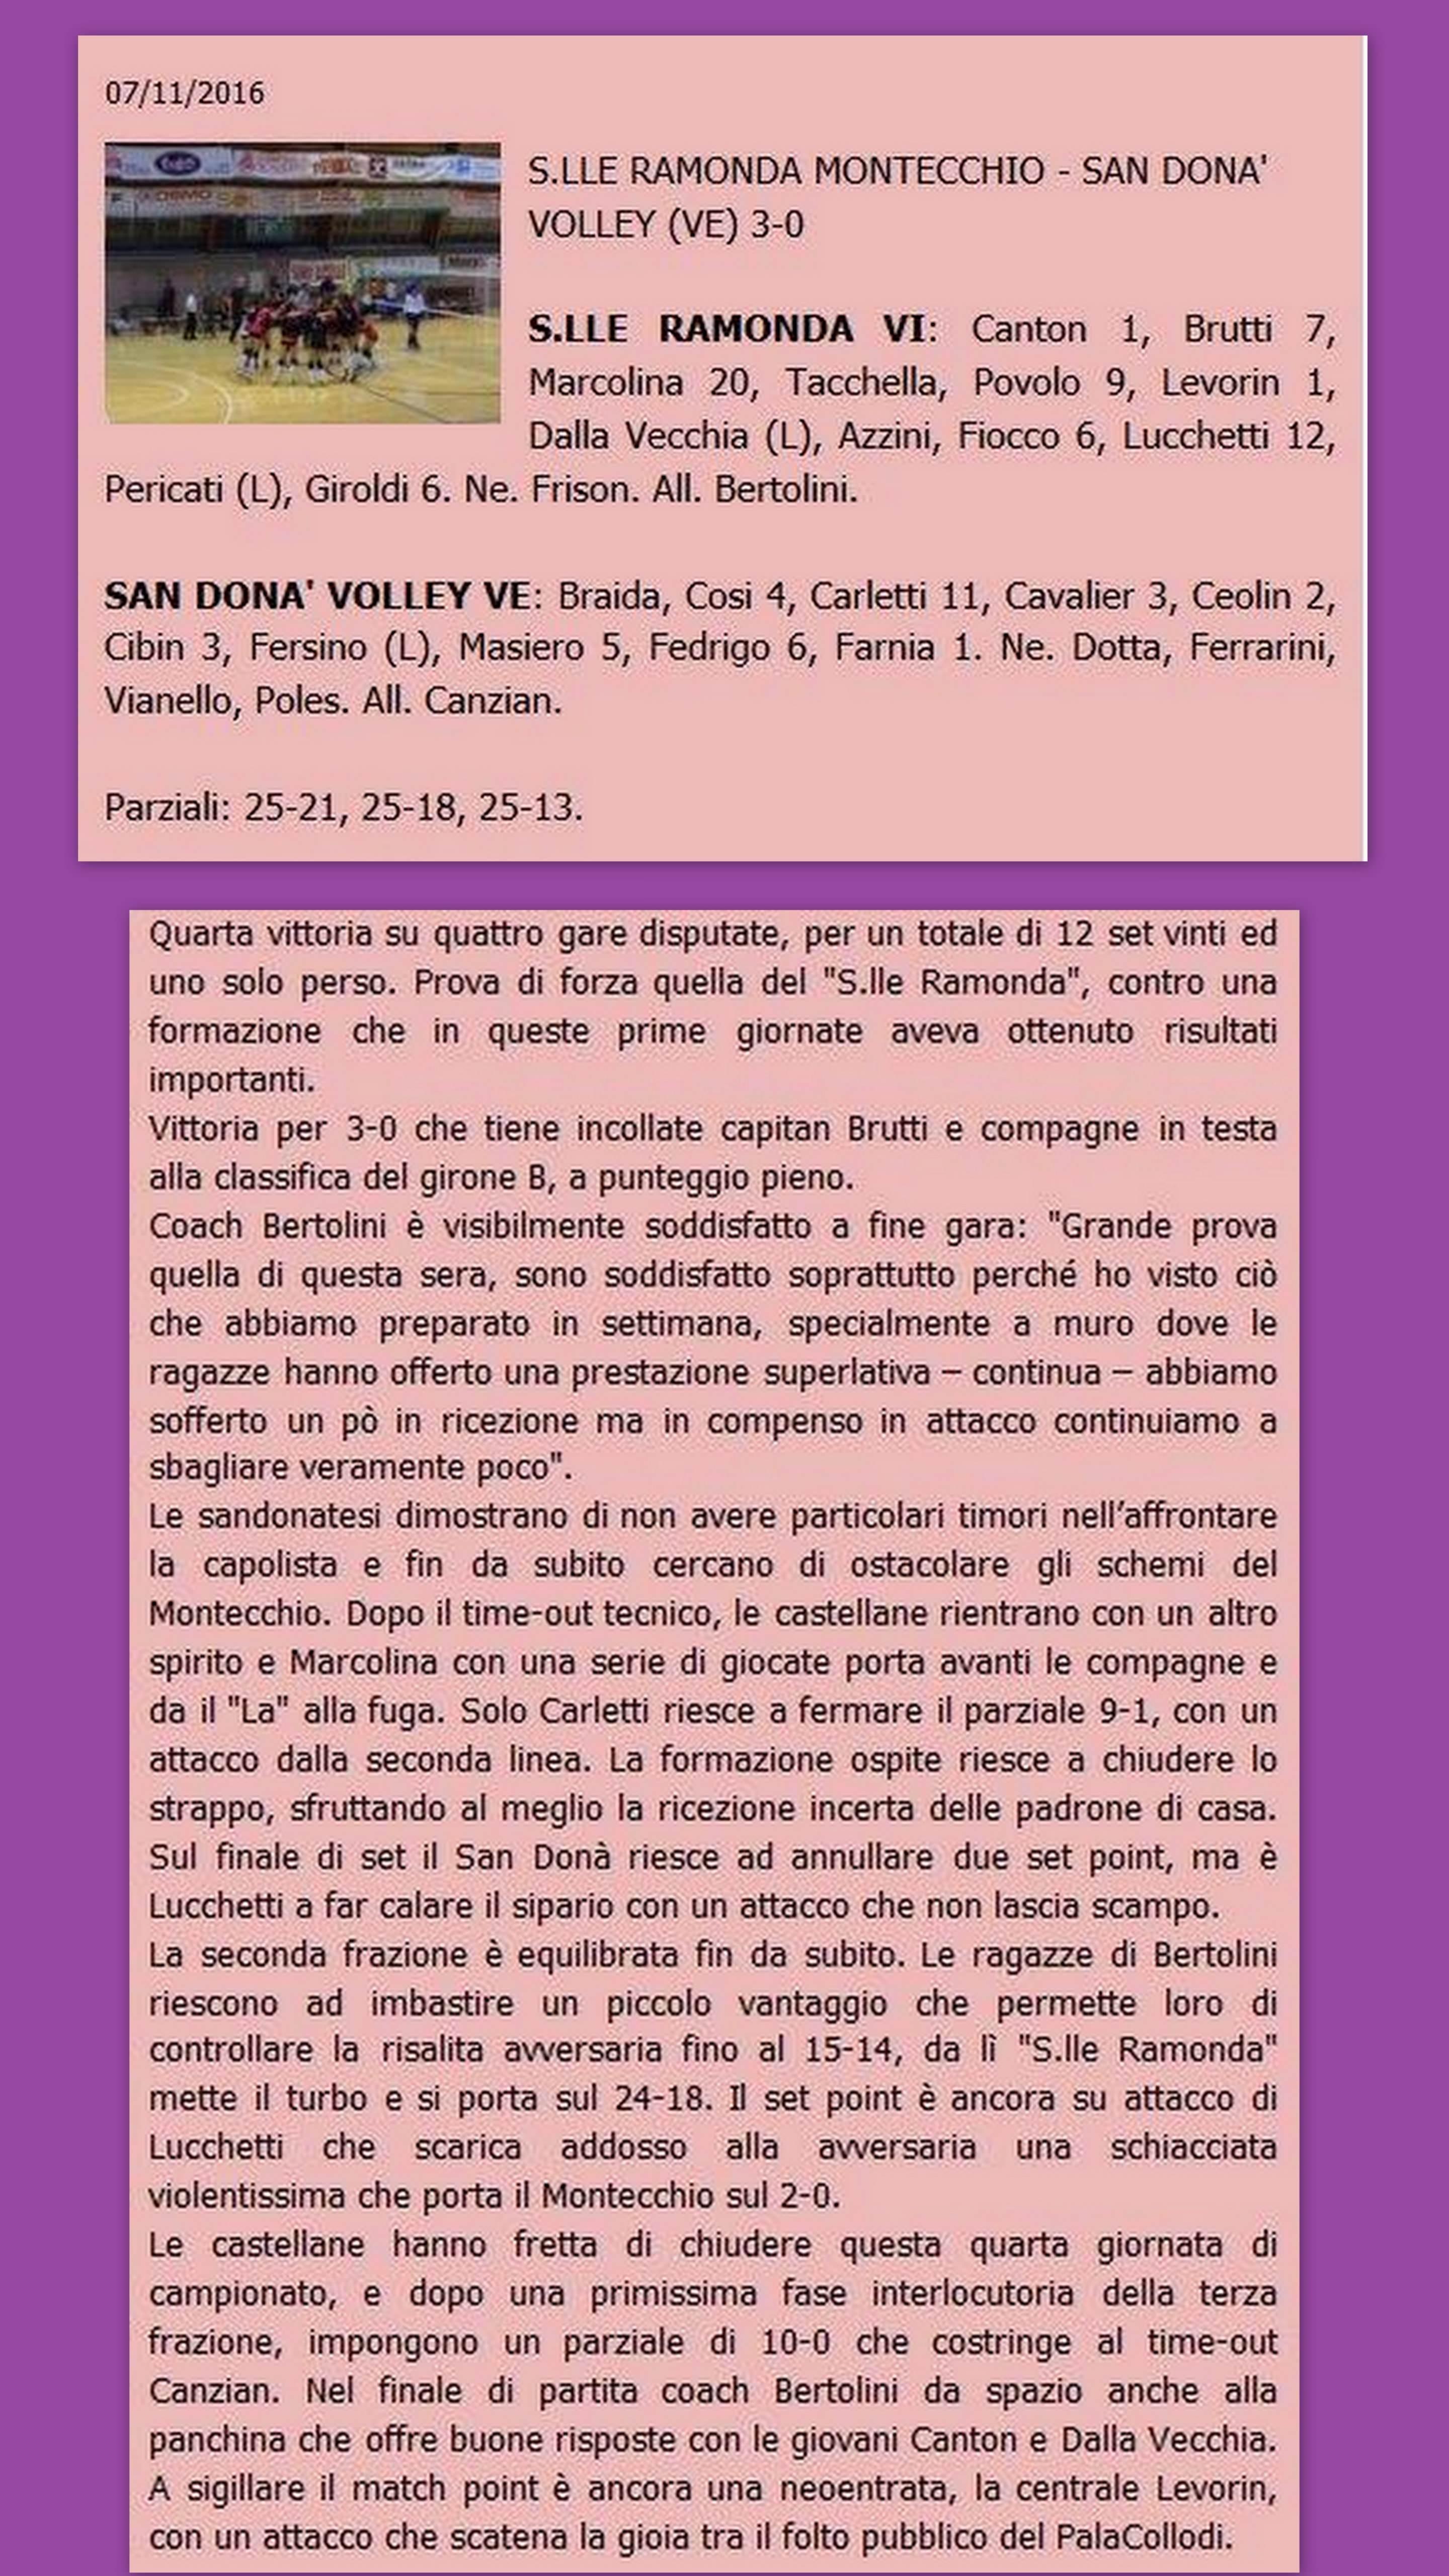 9bis-sito-sorelle-ramonda-montecchio-gara-b1